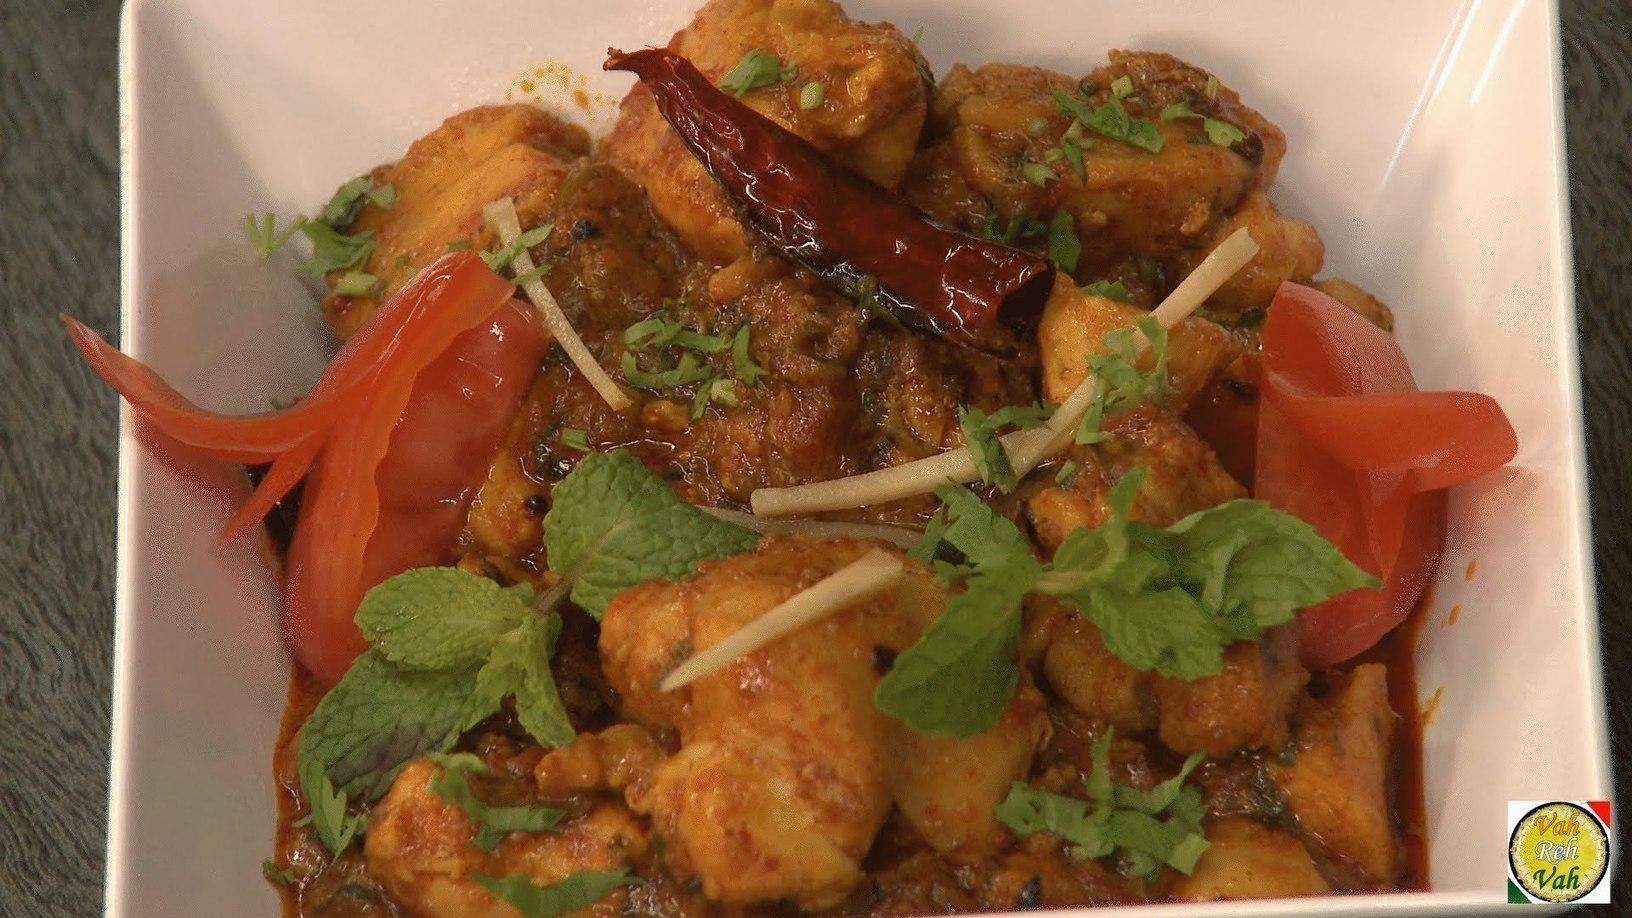 Achari Chicken The Asian Food Gazette Sco Bumbu Nasi Hainan Veggie Way Hainam Vegan